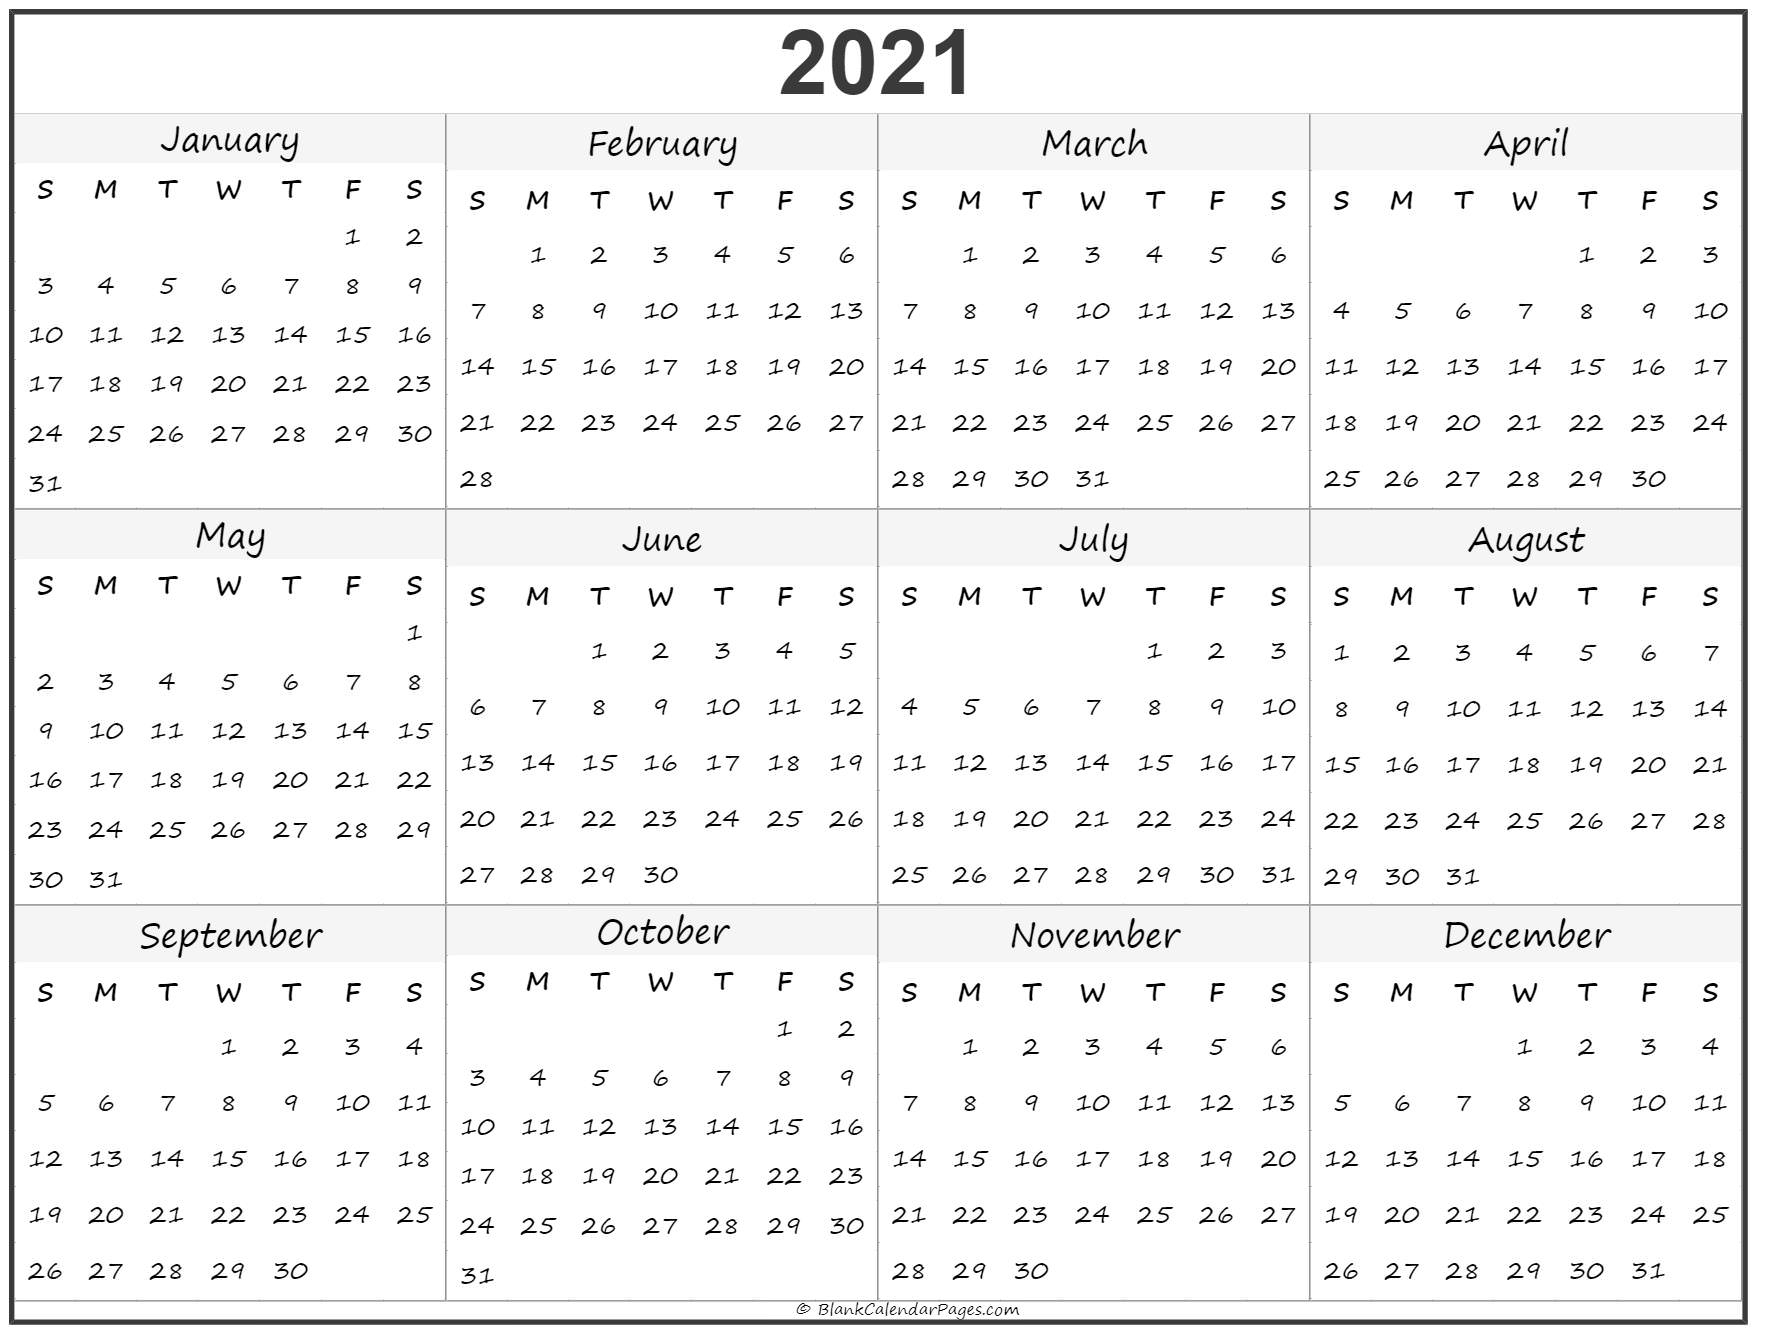 2021 Year Calendar Yearly Printable 1